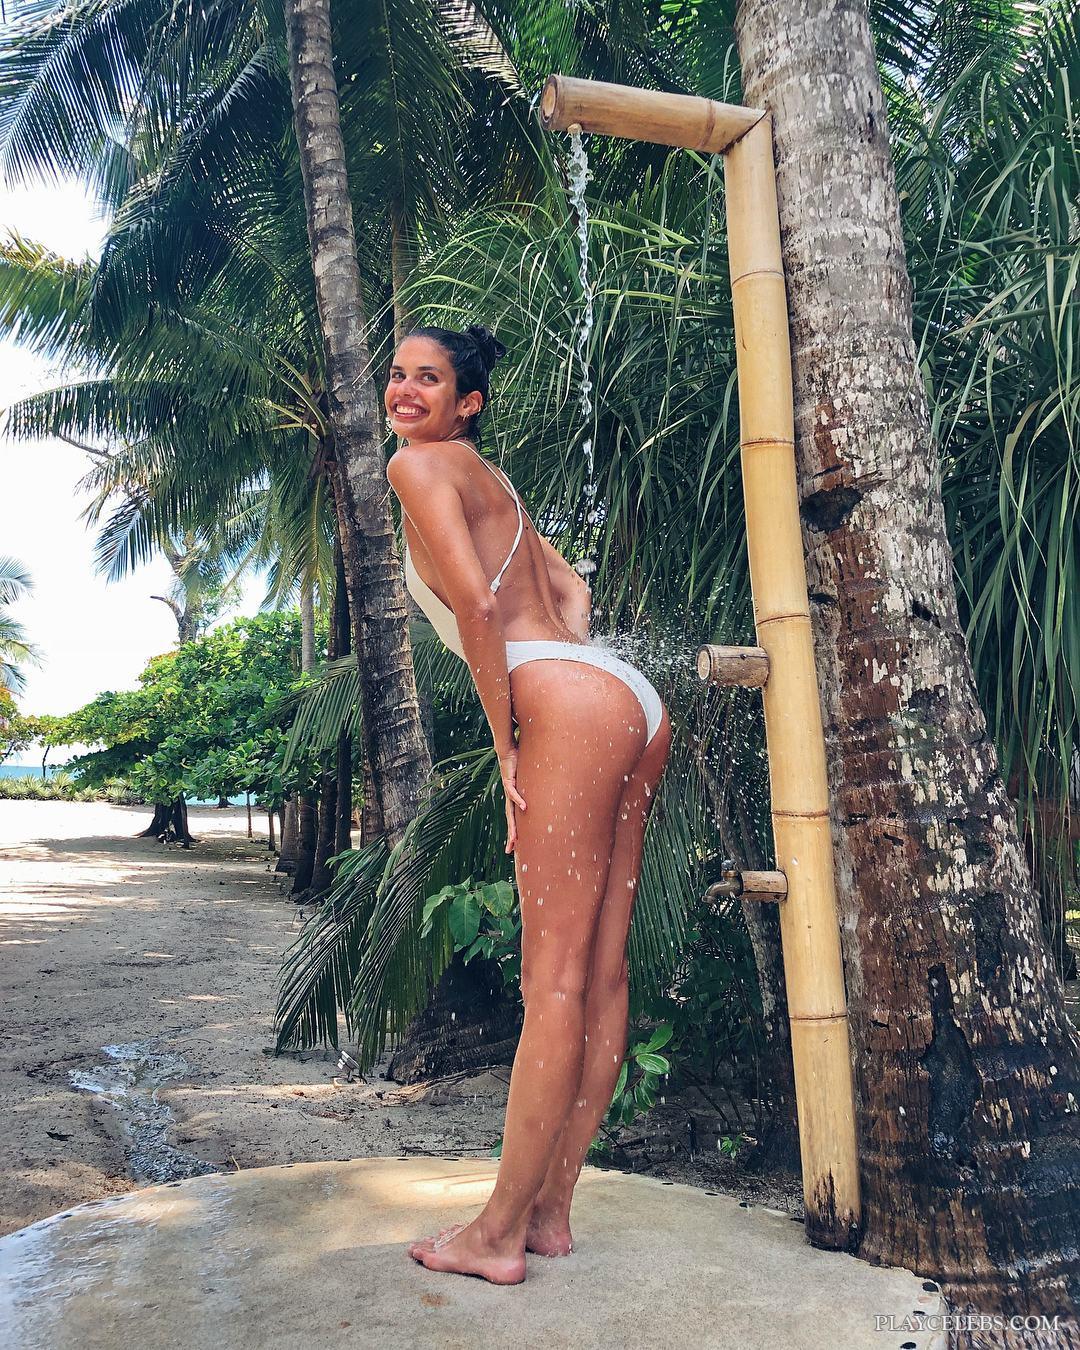 Sara Sampaio Exposing Her Tight Bum Under The Shower